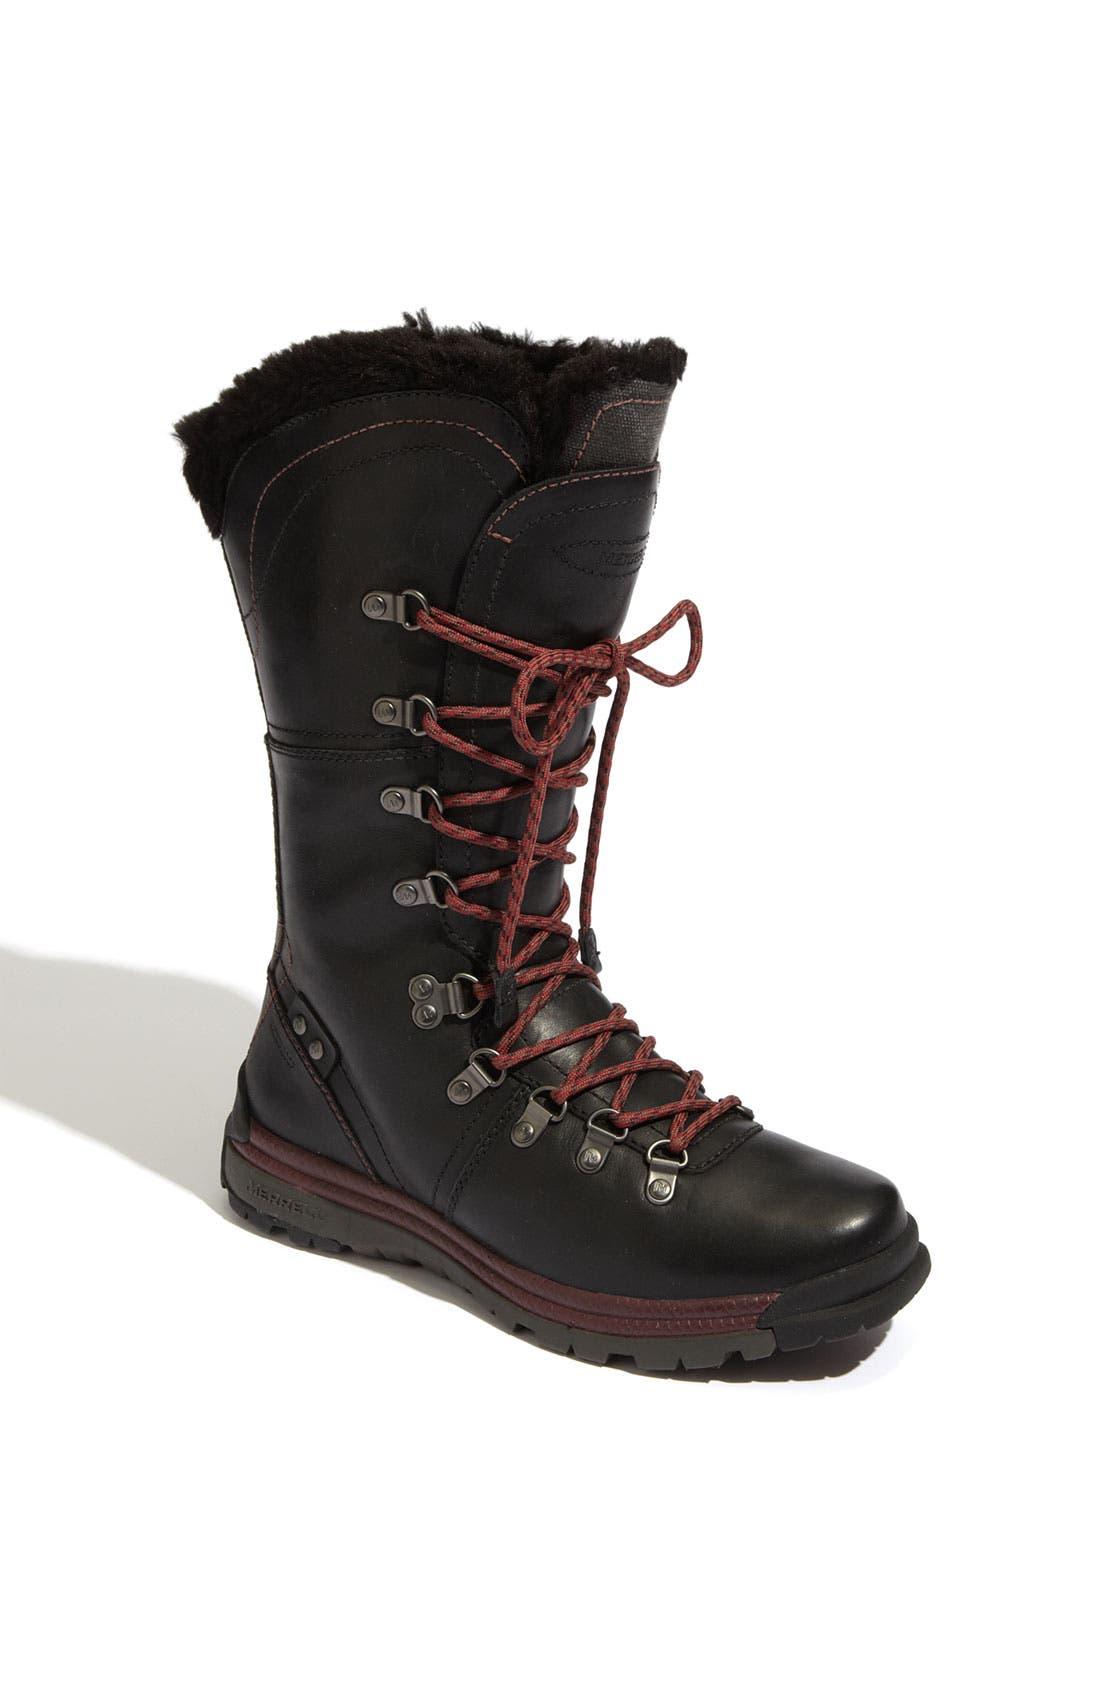 MERRELL 'Natalya' Waterproof Boot, Main, color, 001